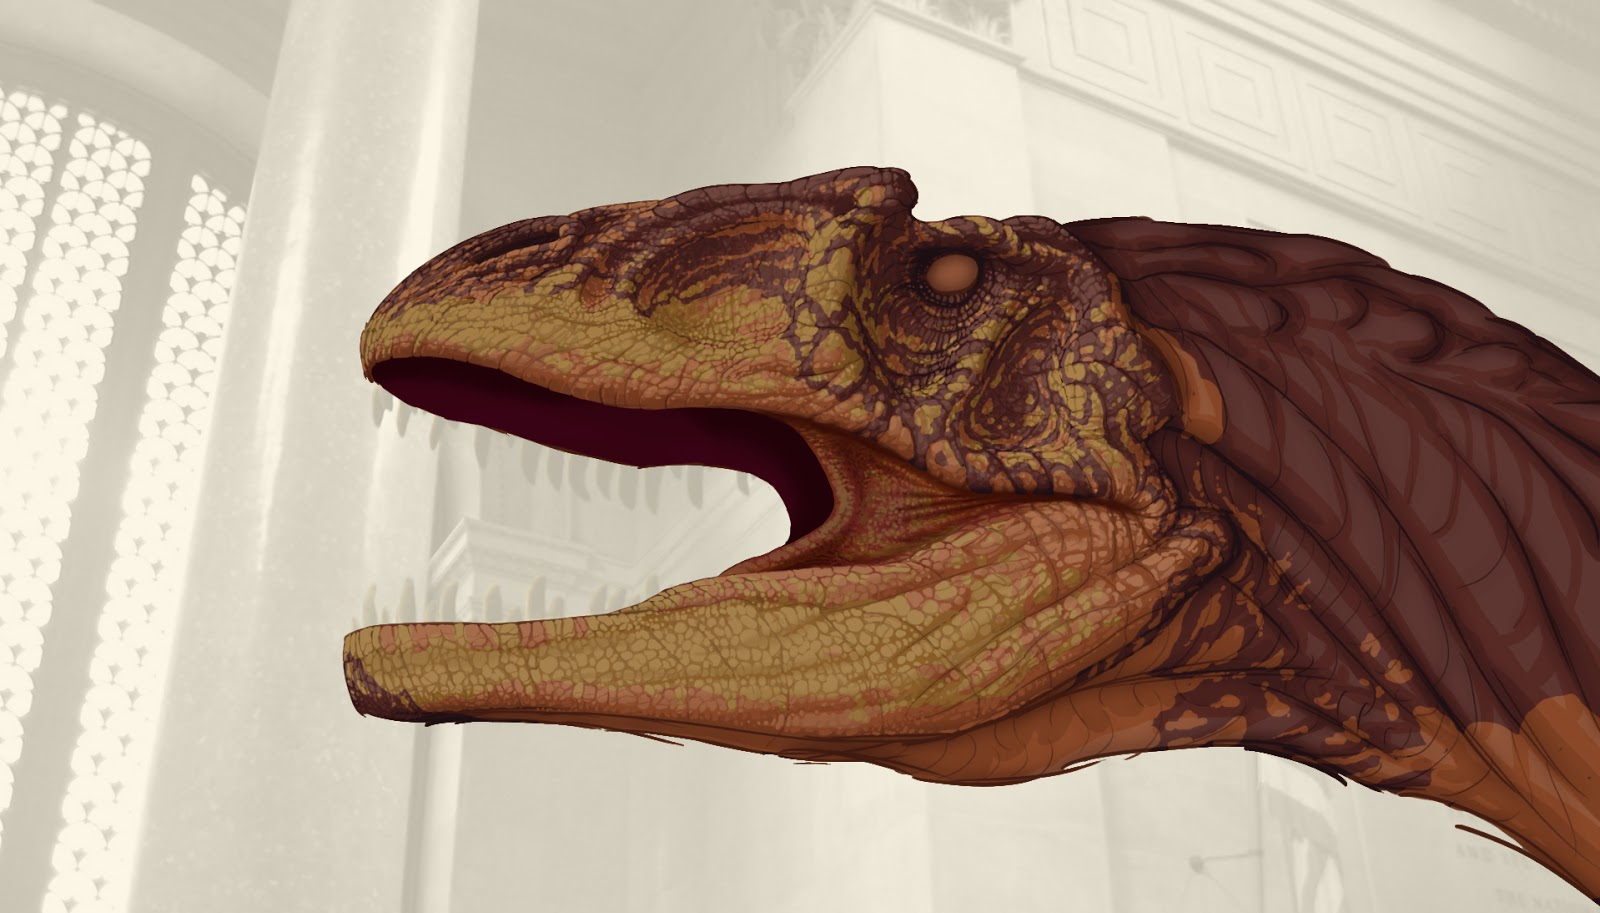 http://4.bp.blogspot.com/-lSd3UBGySNI/TxVkjWI1XEI/AAAAAAAAALc/Epun8U40pu4/s1600/allosaurus+walkeeri+-+004.jpg